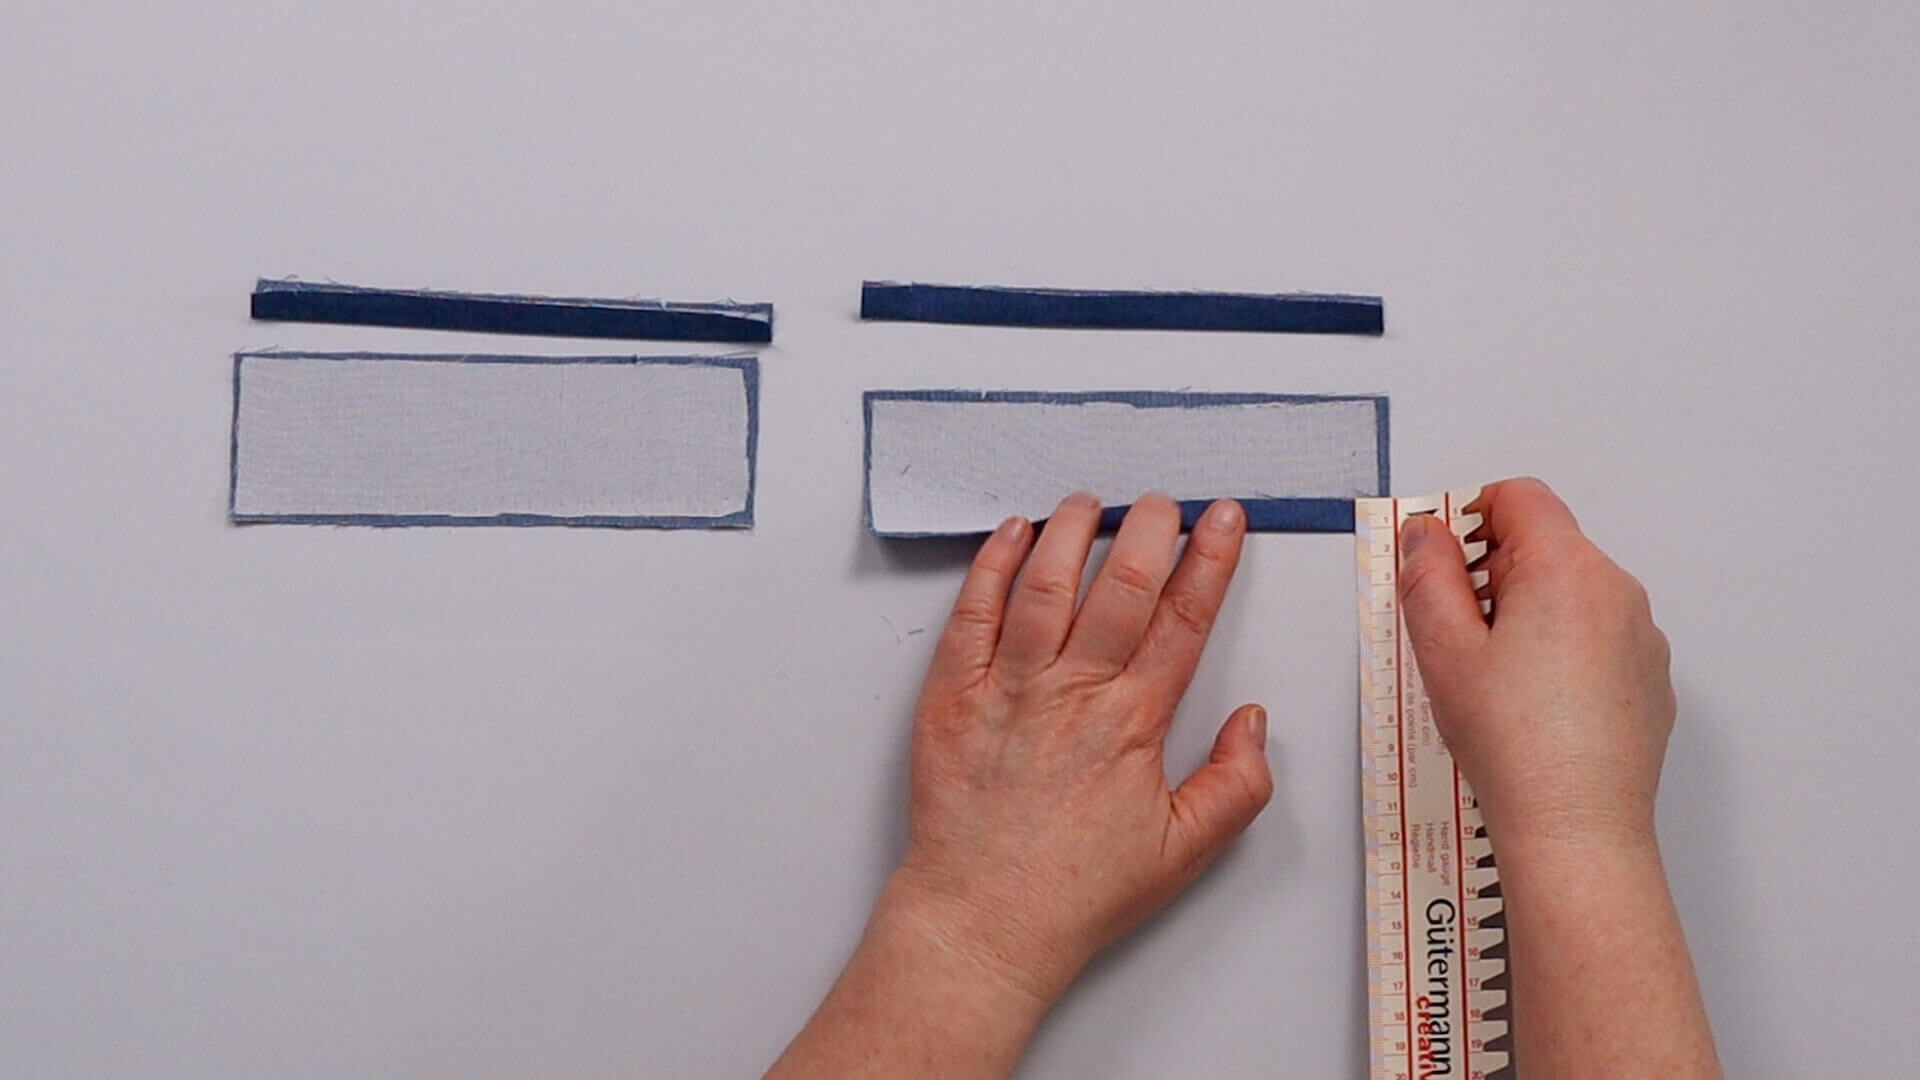 Nähanleitung Paspeltasche- Taschenpaspel fixieren und umbügeln